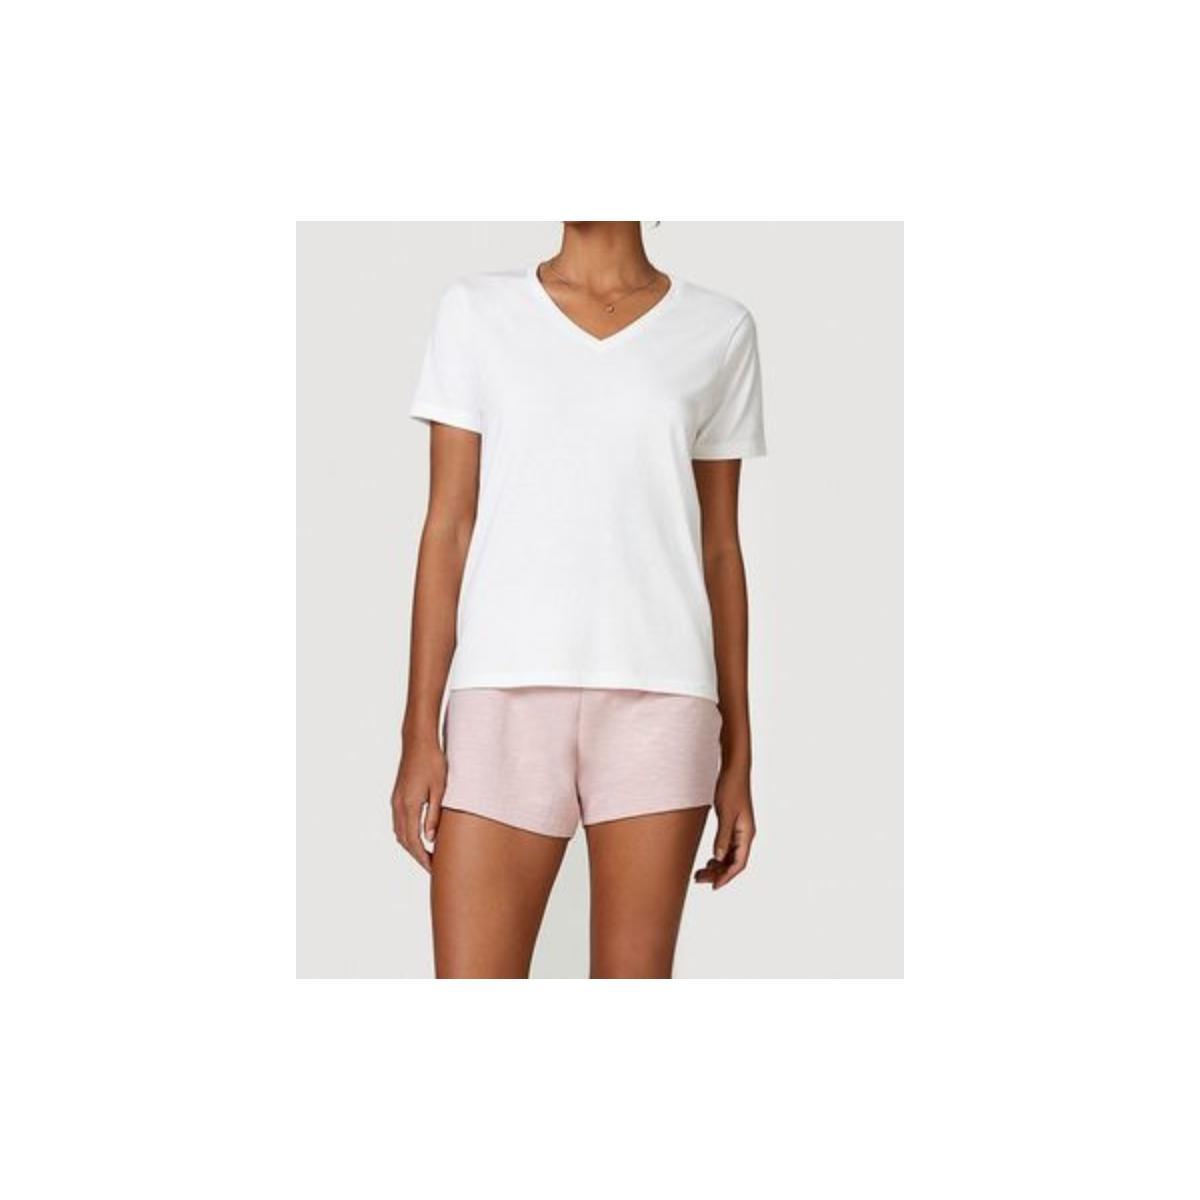 Pijama Feminina Hering 7bwv 1ben Off White/rosa